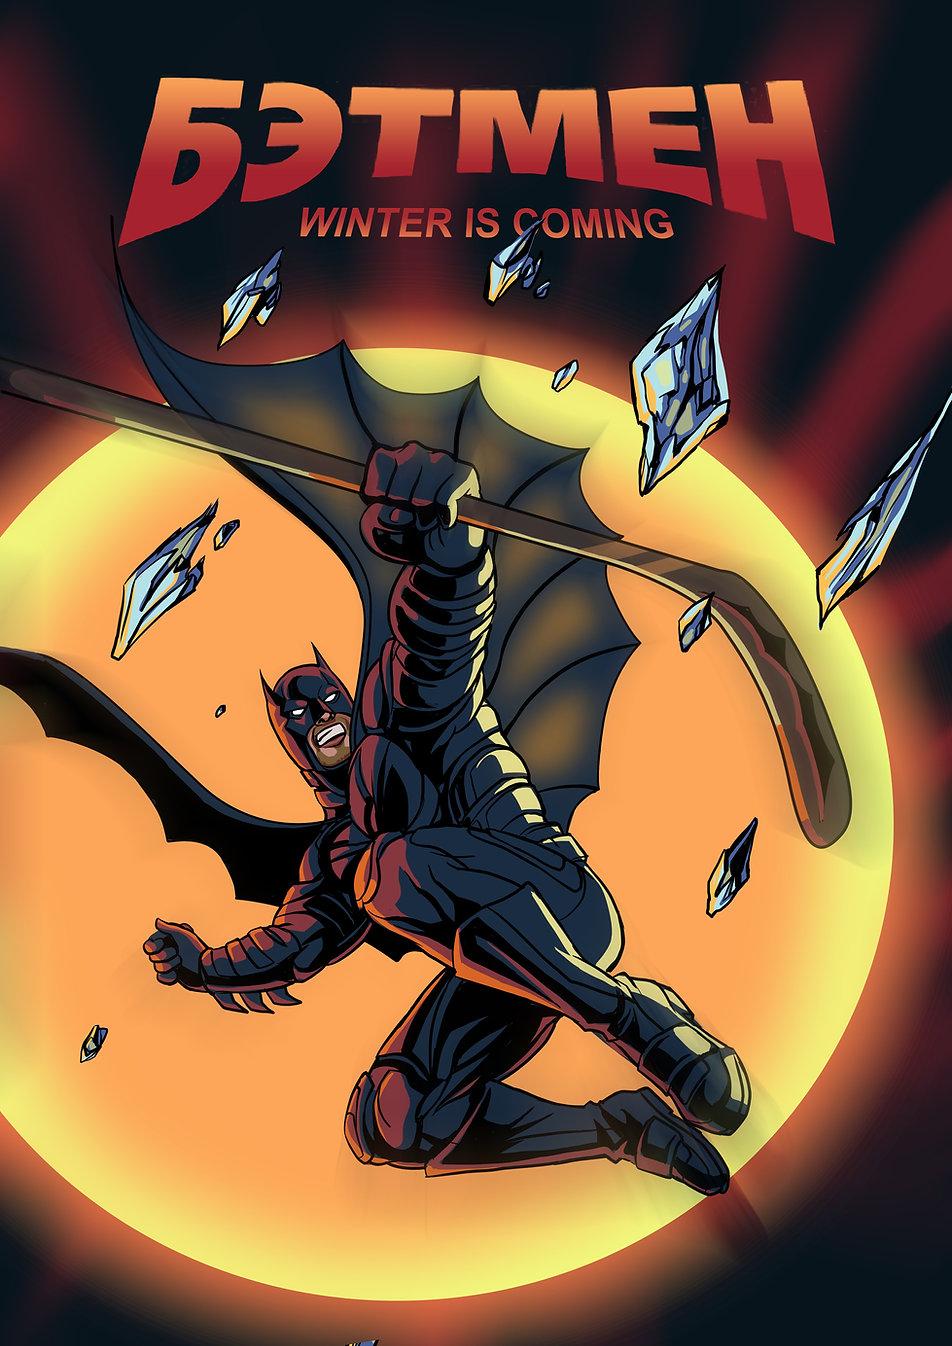 Авторский комикс другу на заказ. Бэтмен. Обложка.